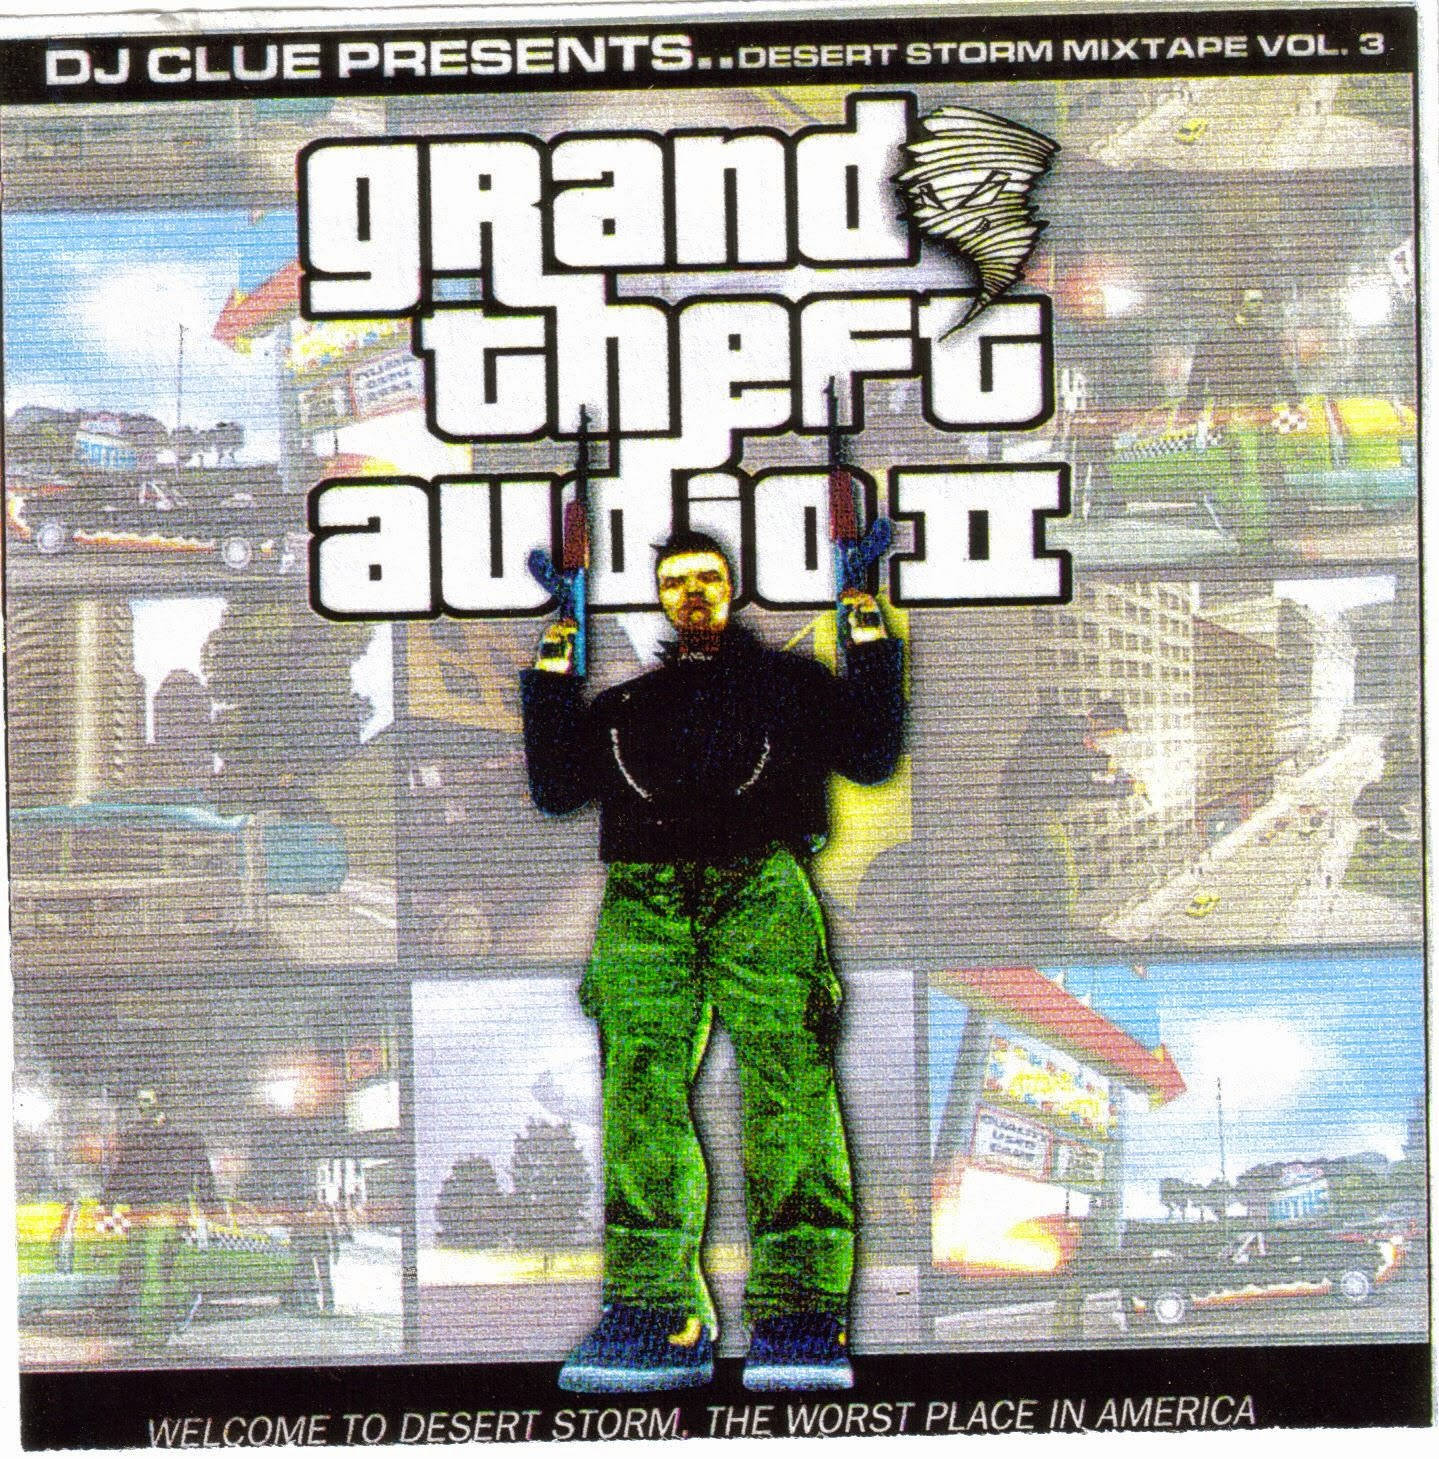 DJ CLUE? THE Perfect Desert Storm Classic NYC Mixtape CD